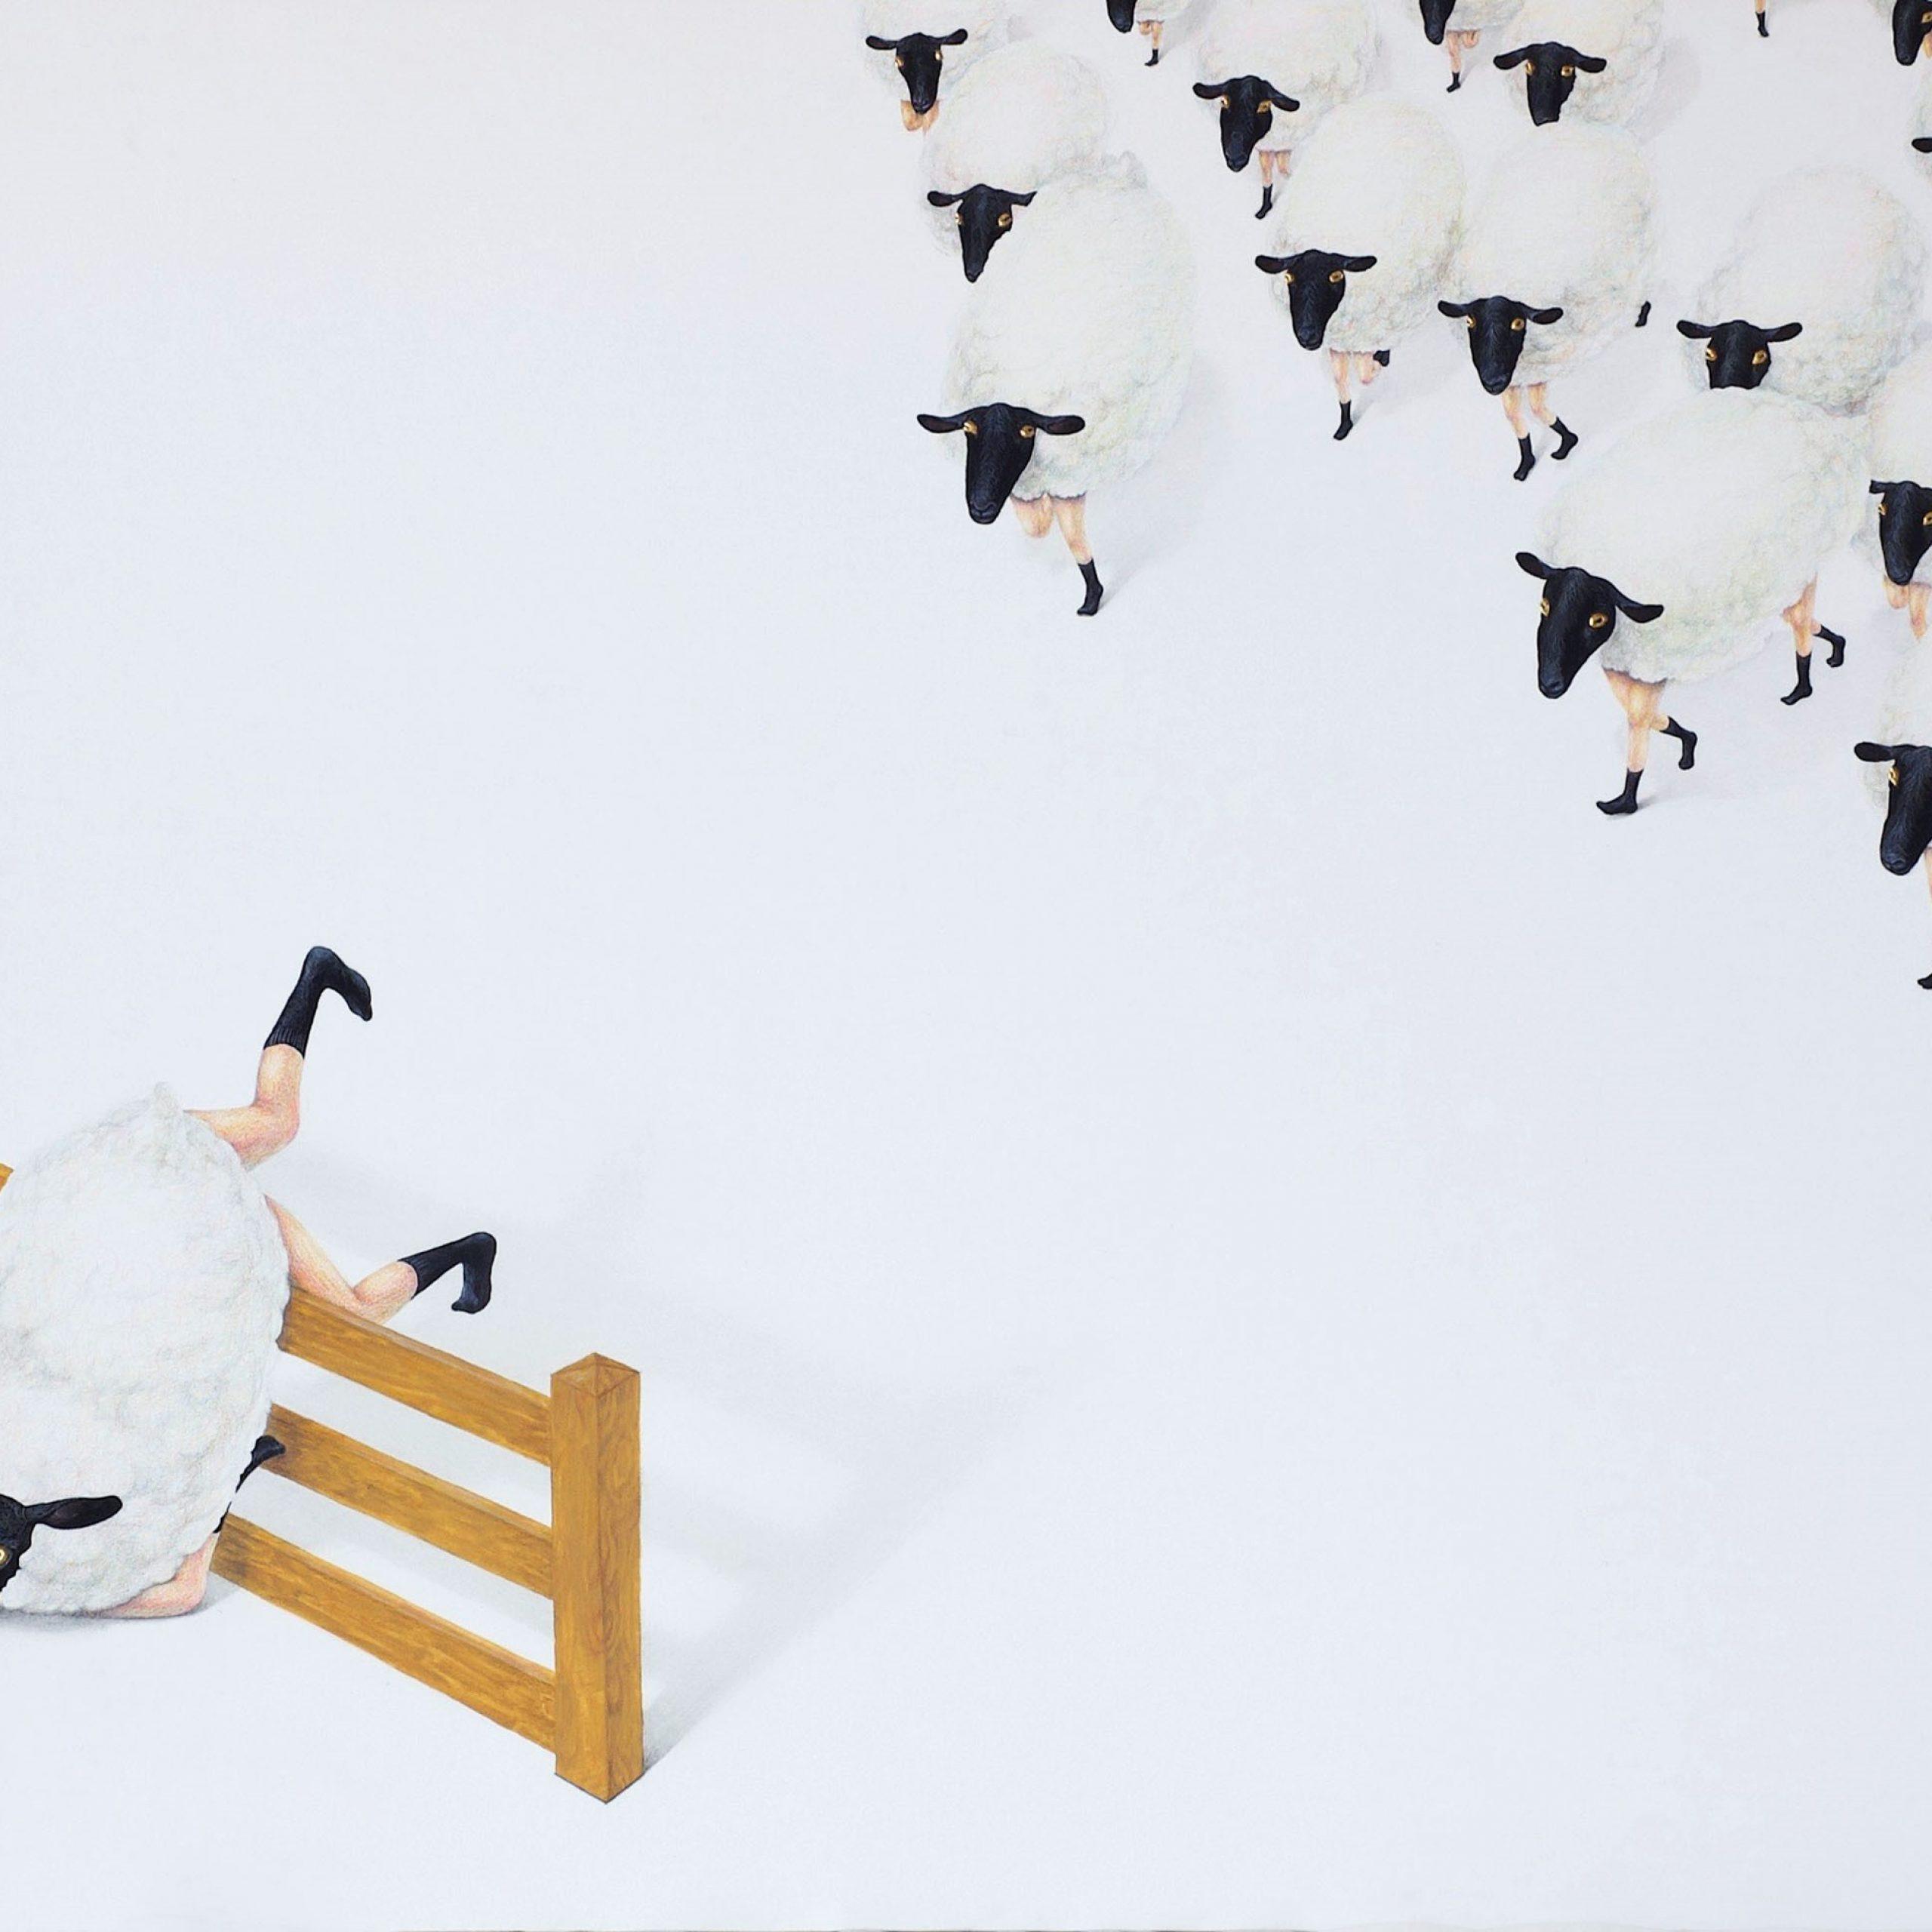 Chihiro Taki, Hide and Seek, Gallery G-77